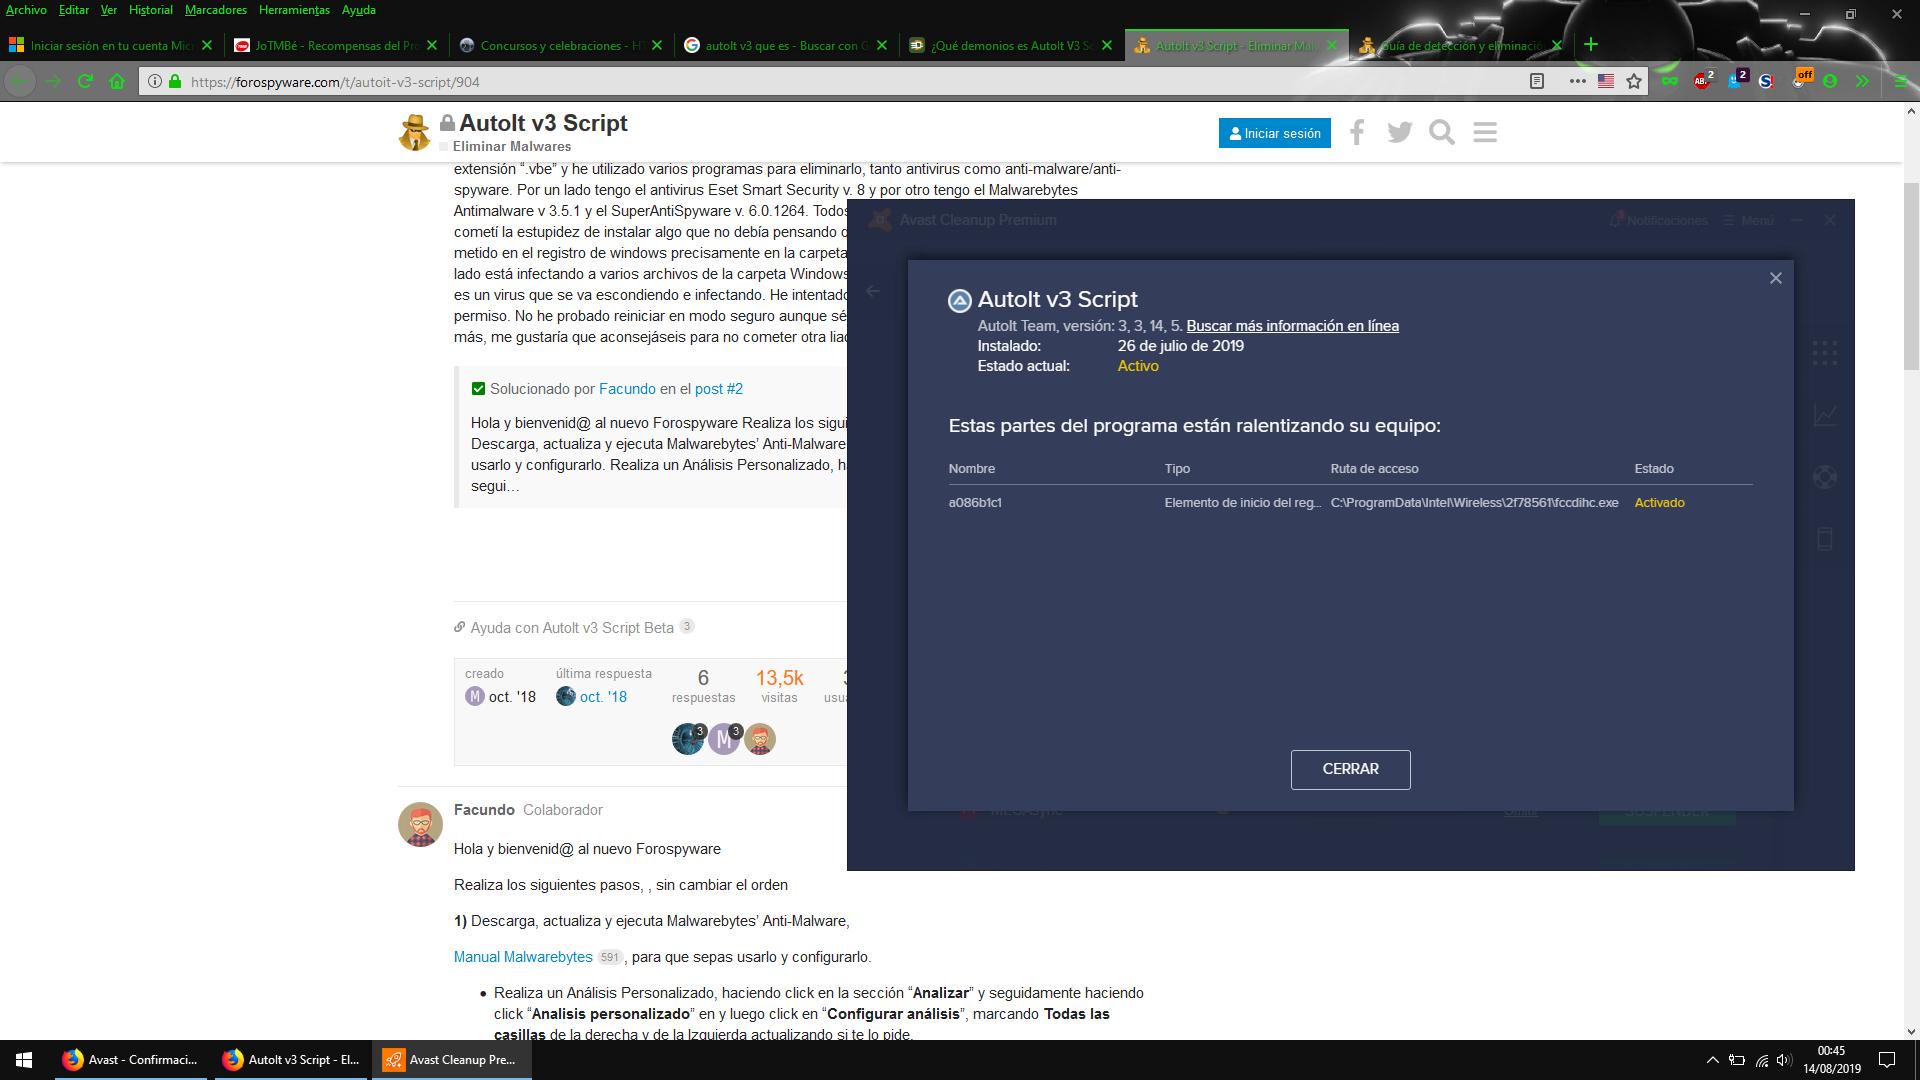 Autolt V3 script - Eliminar Malwares - ForoSpyware